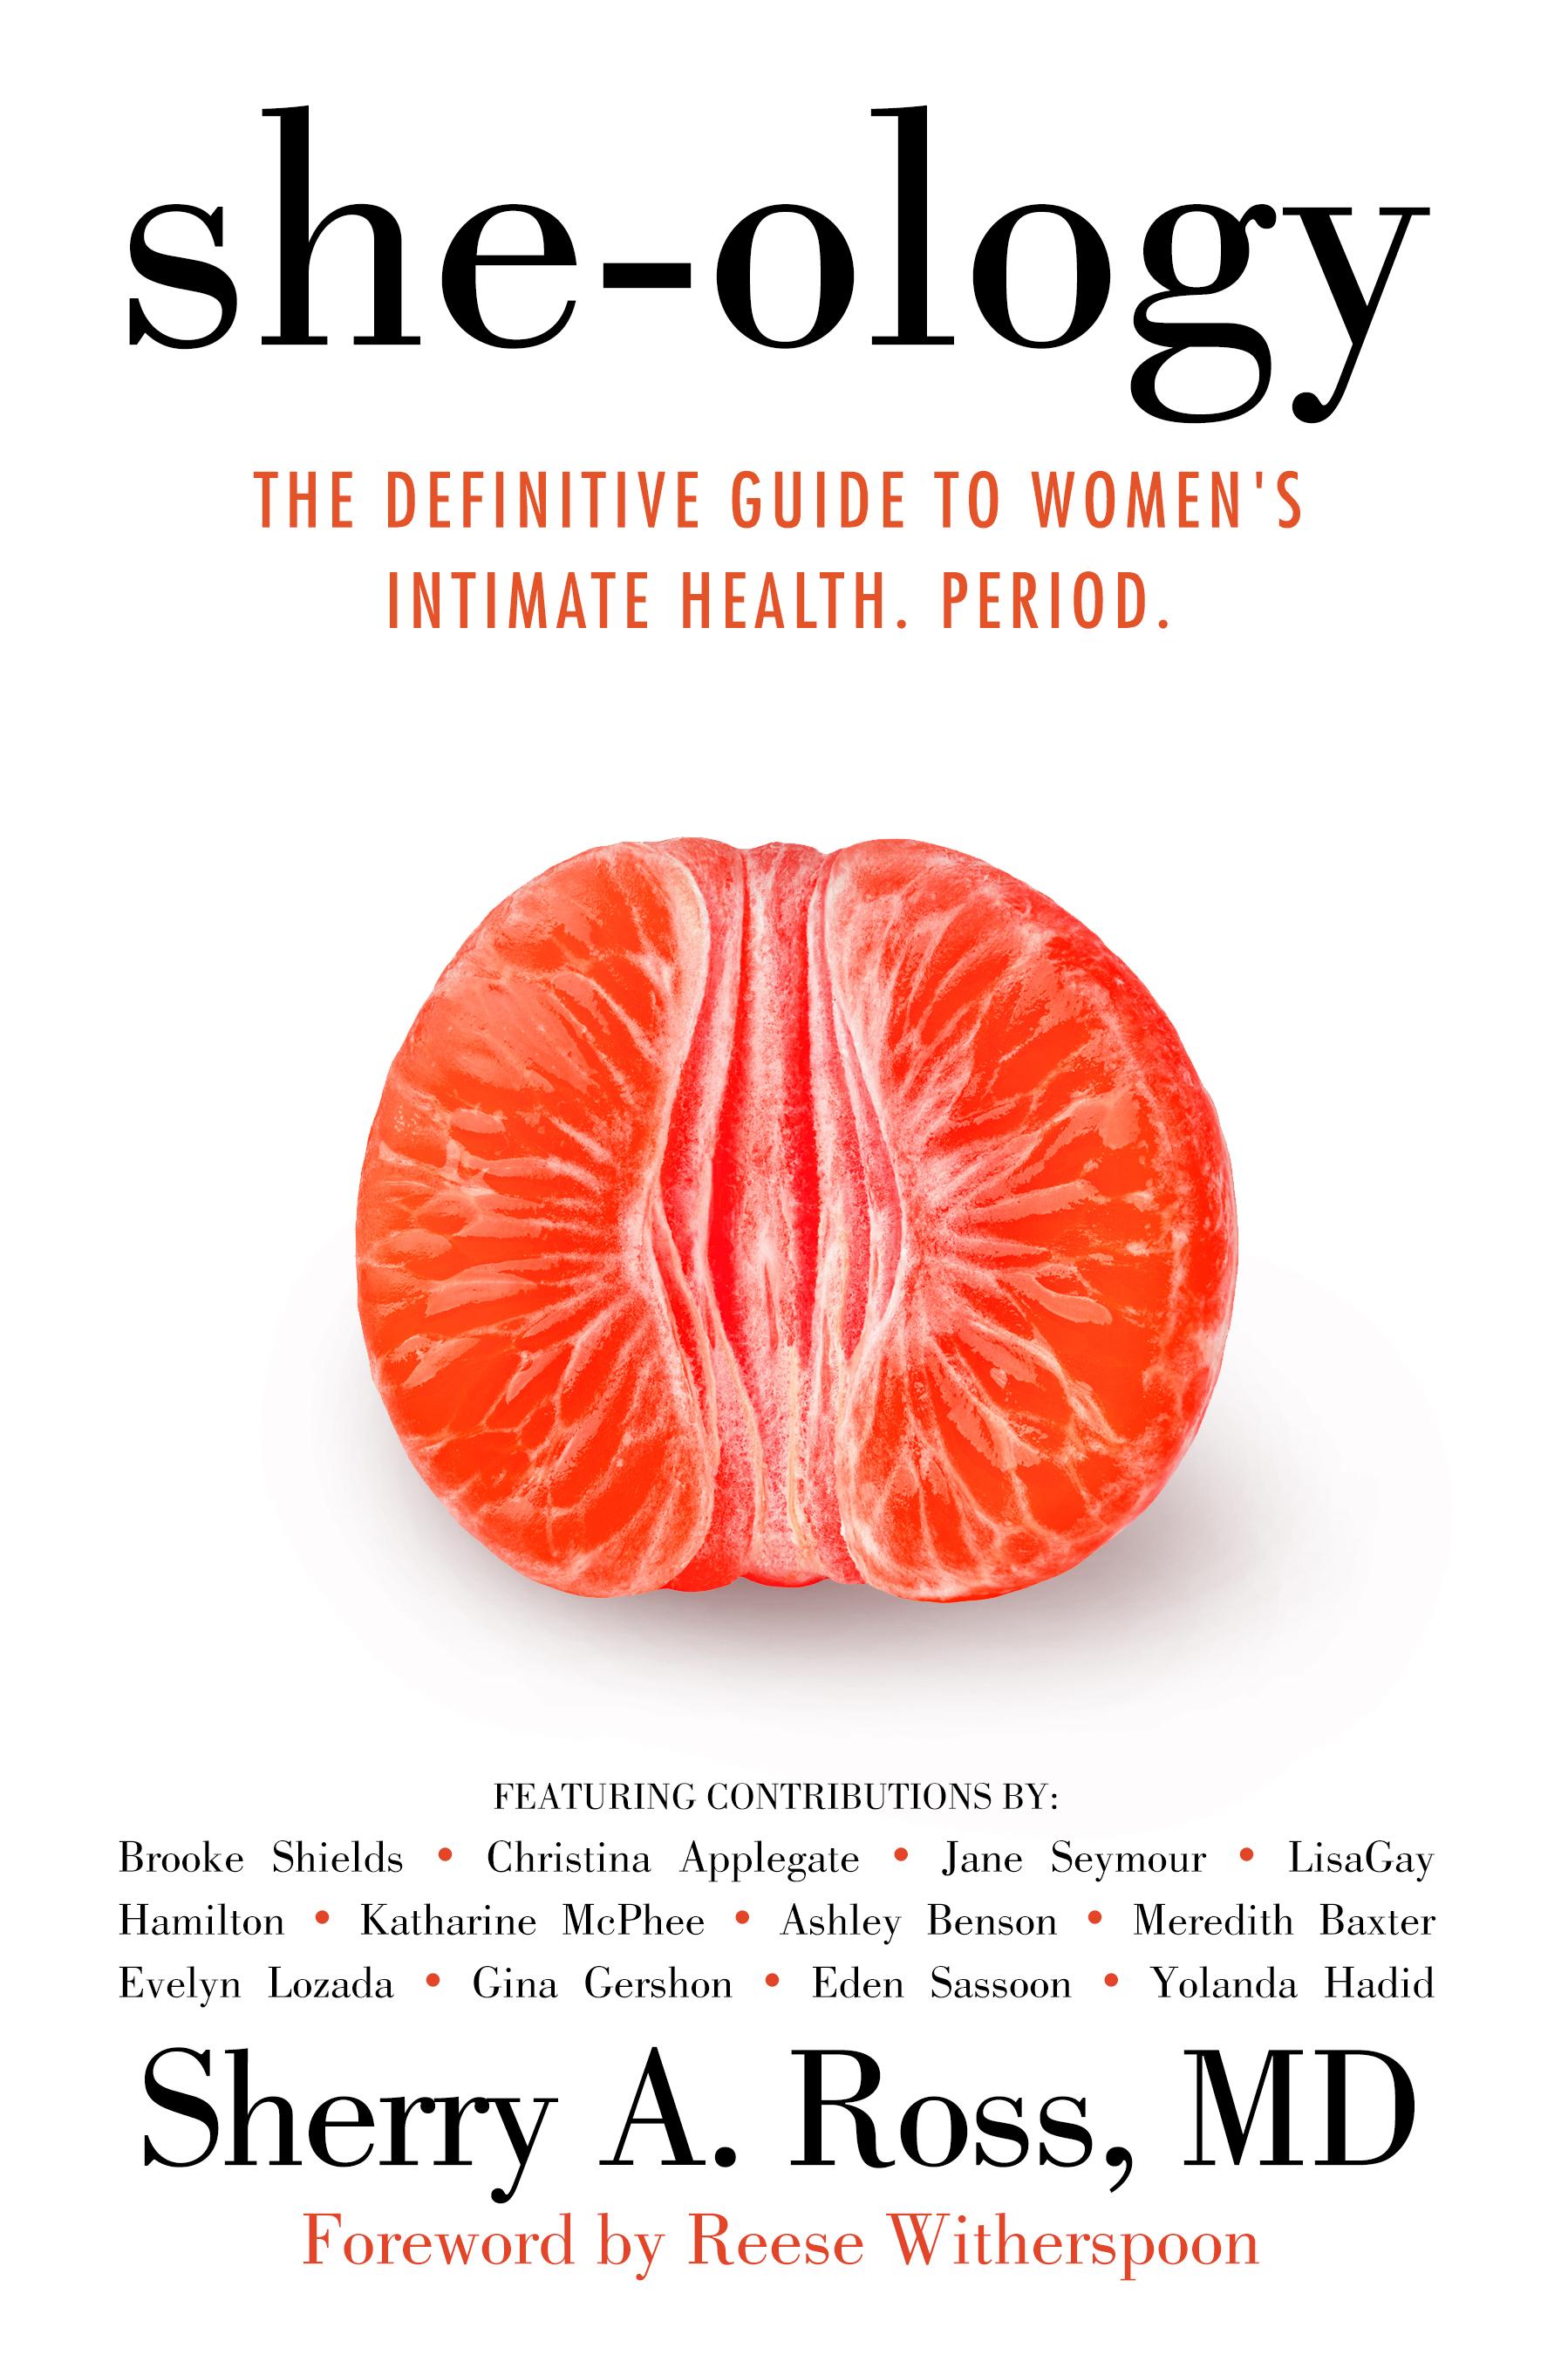 she-ology Book Cover Final Dec 16 2016.jpg